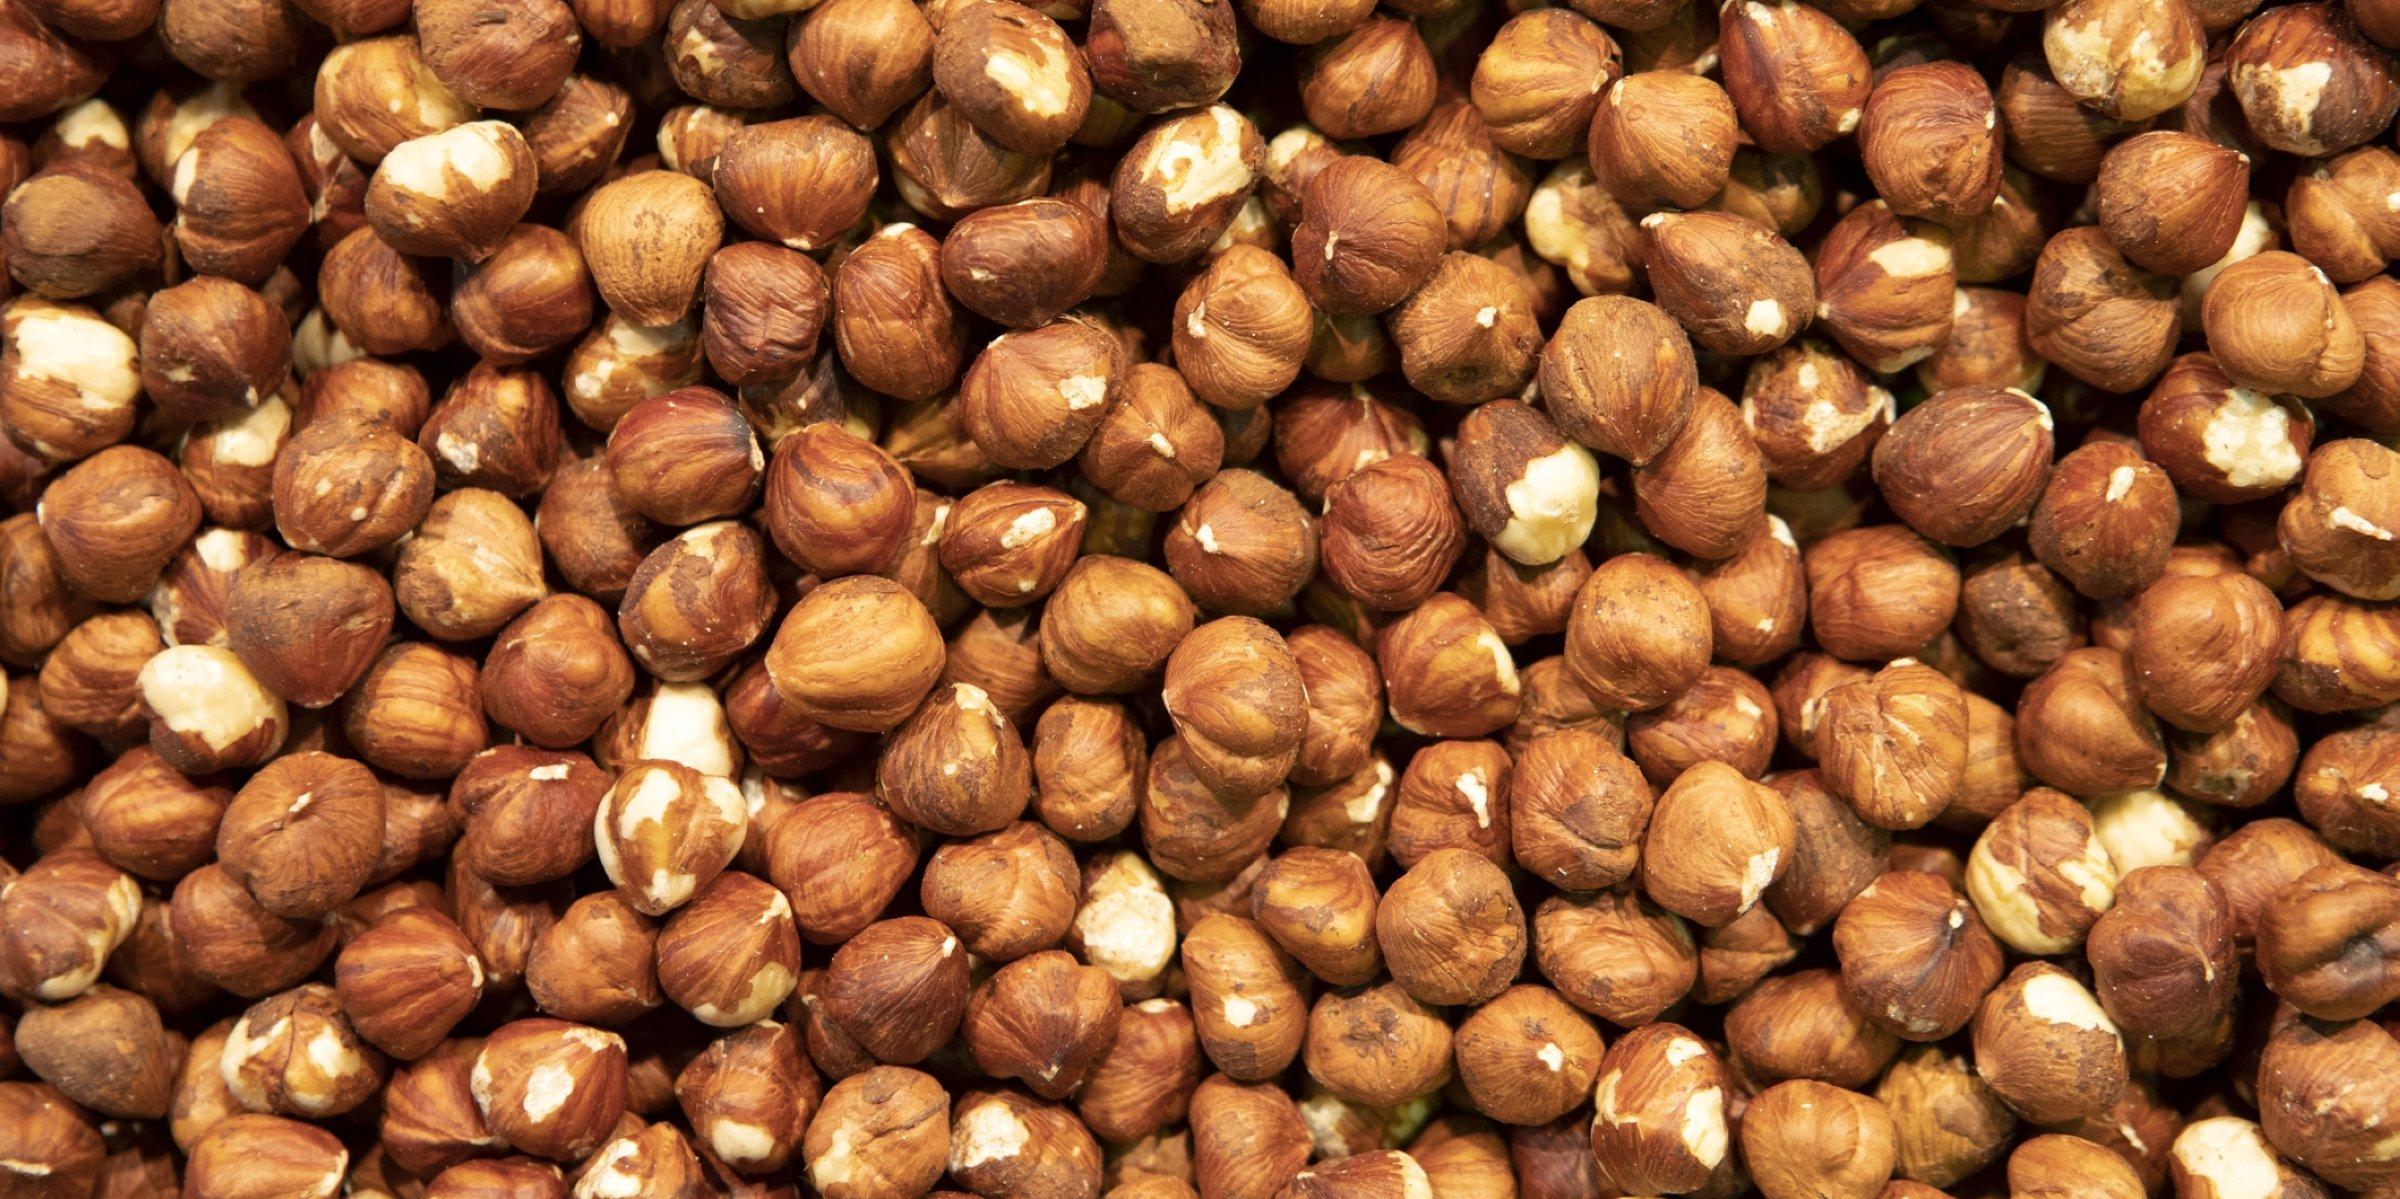 hazelnut price in Turkey